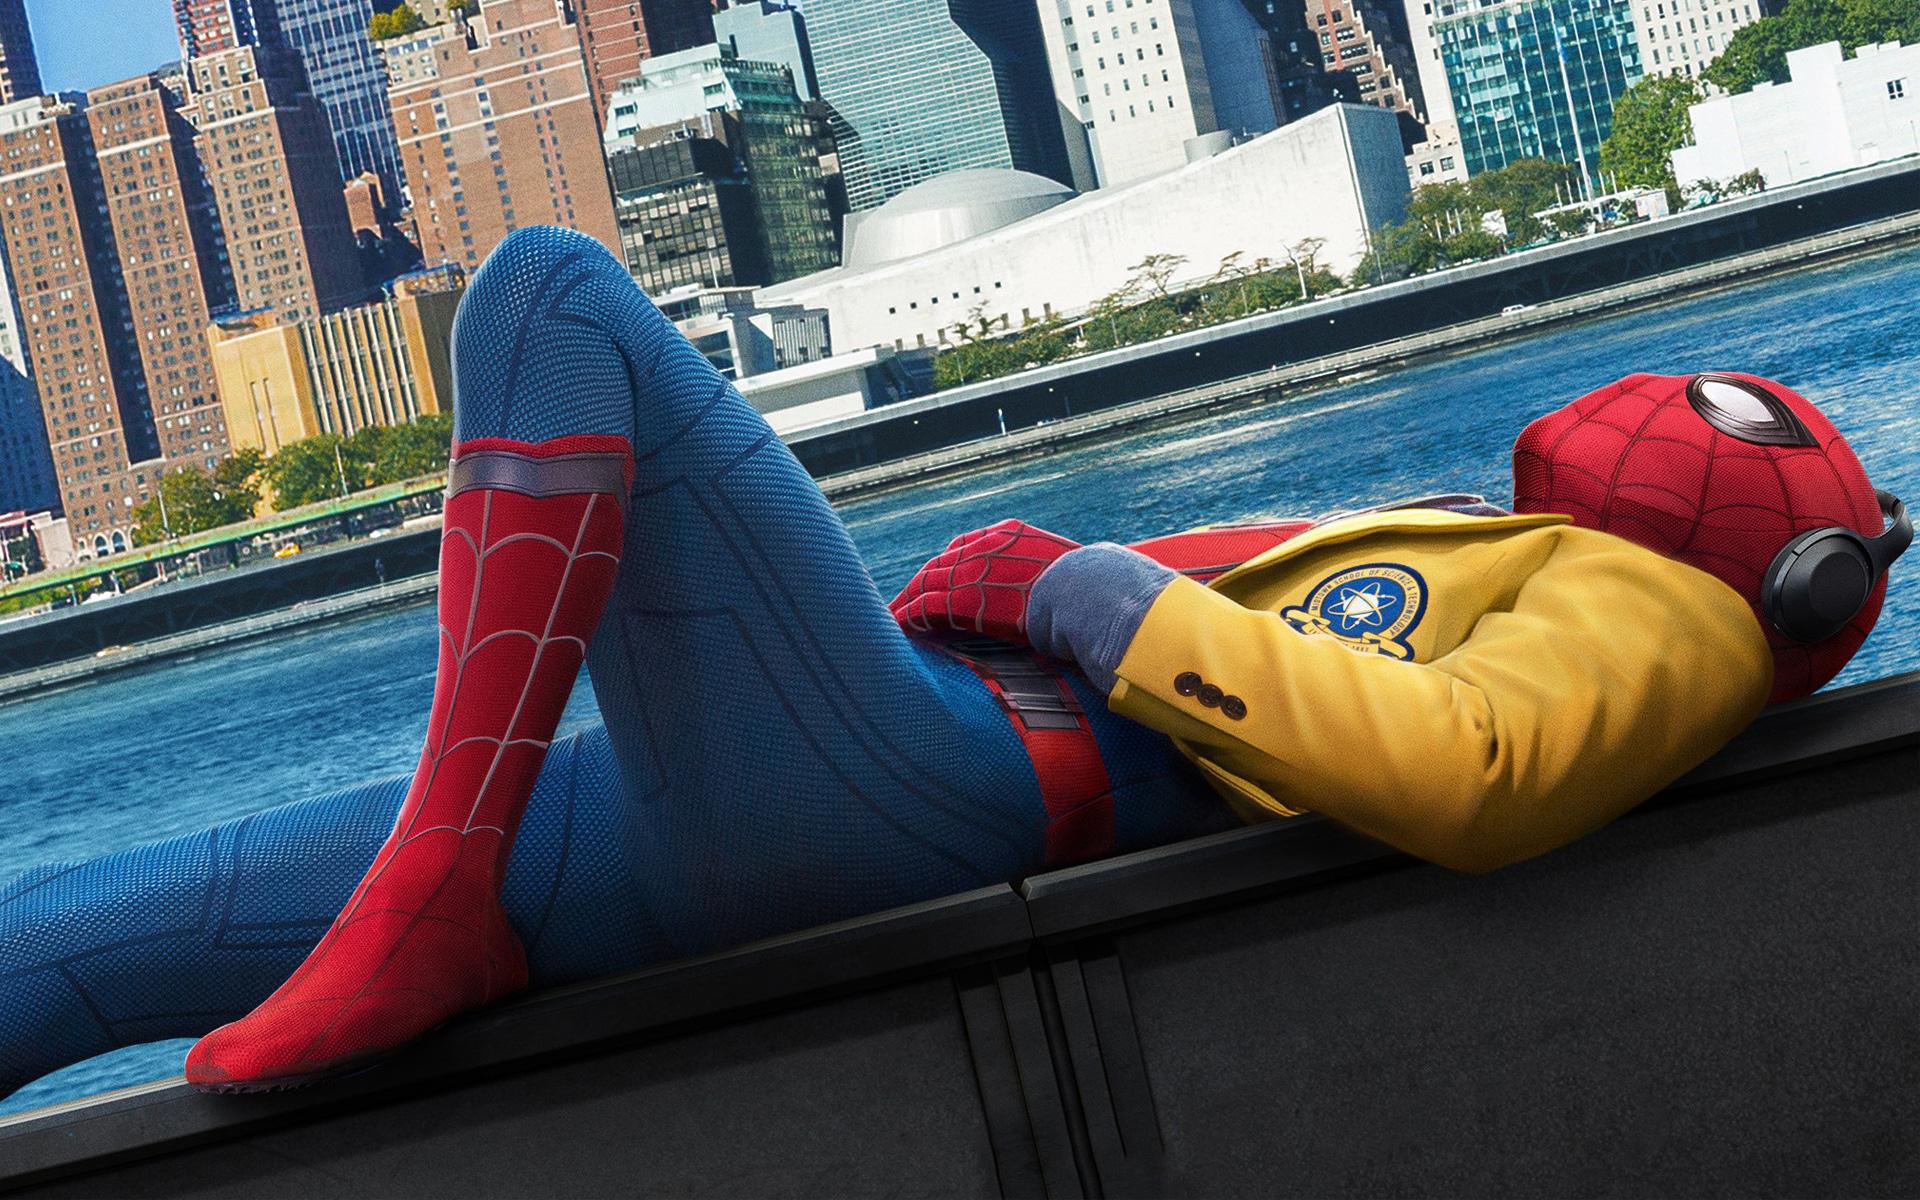 Hd Kung Fu Panda Wallpapers Spider Man Homecoming 2017 Movie Desktop Wallpapers